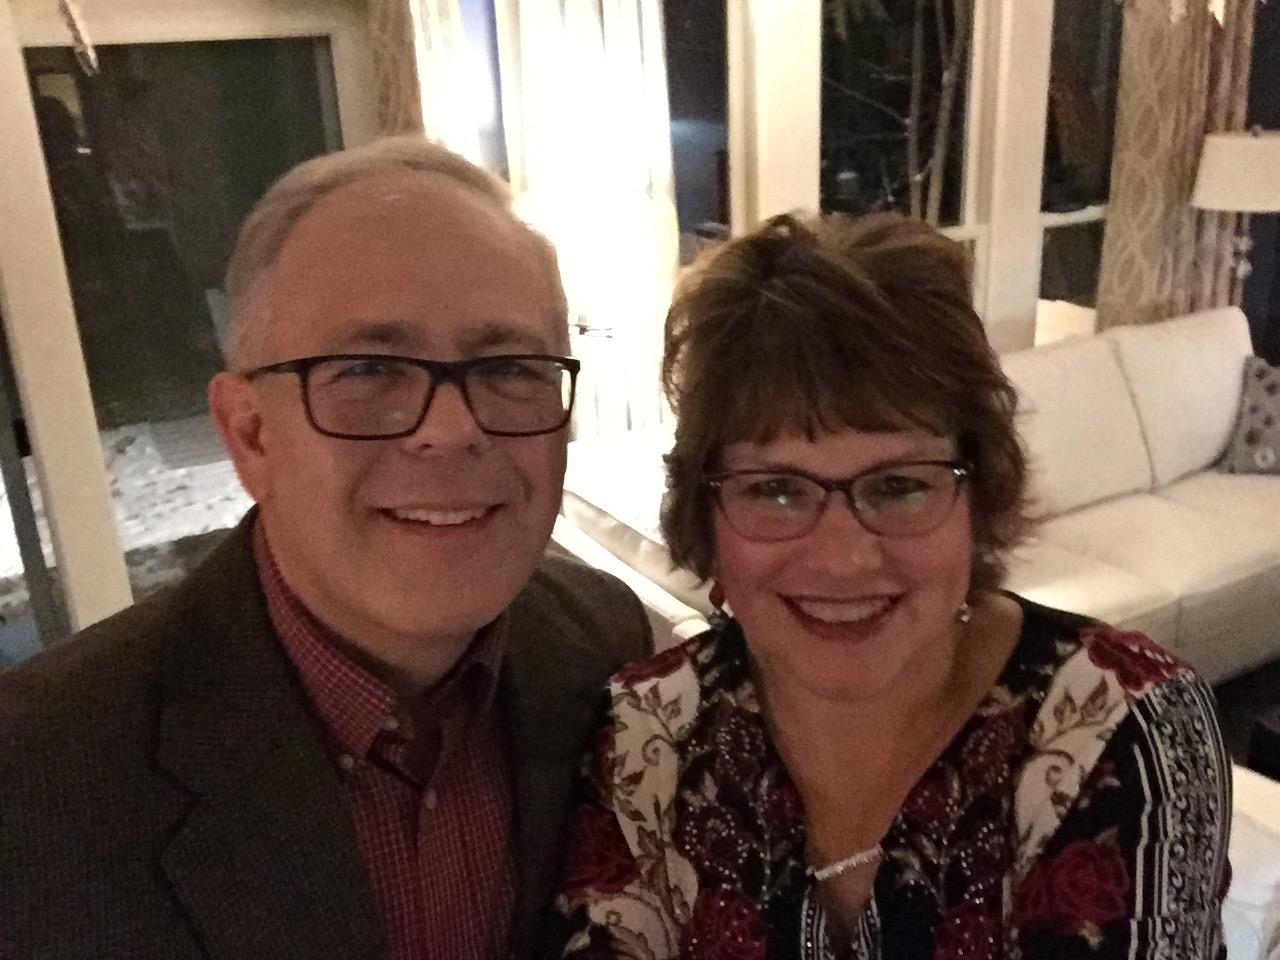 John and Fran -- enjoying Christmas Eve!